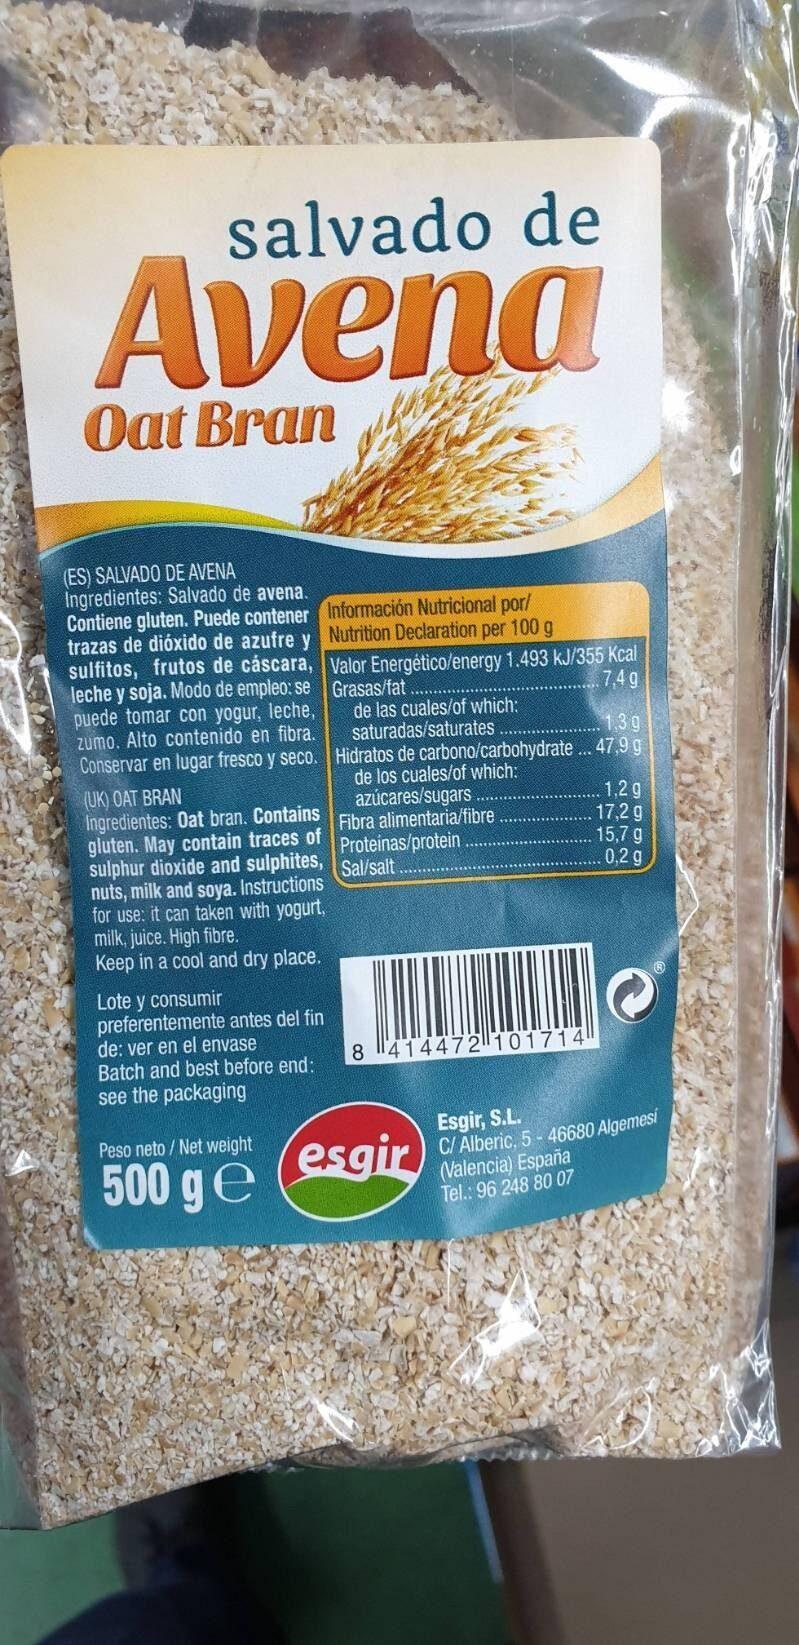 Salvado de avena oat bran - Ingrediënten